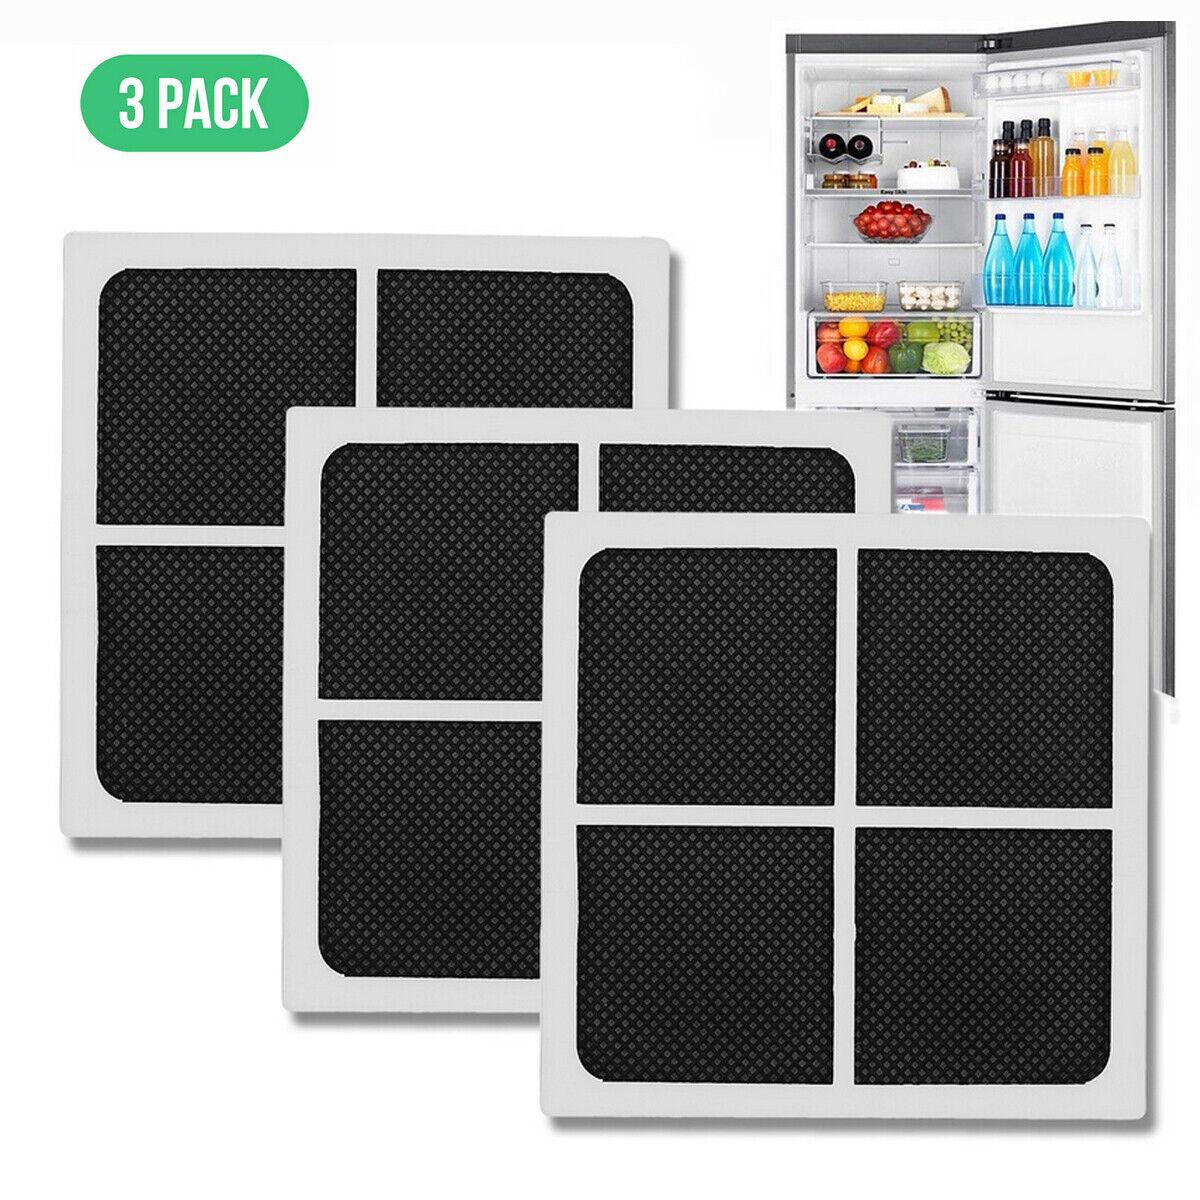 3-Pack Replacement Refrigerator Air Filter fits LG LT120F Ke